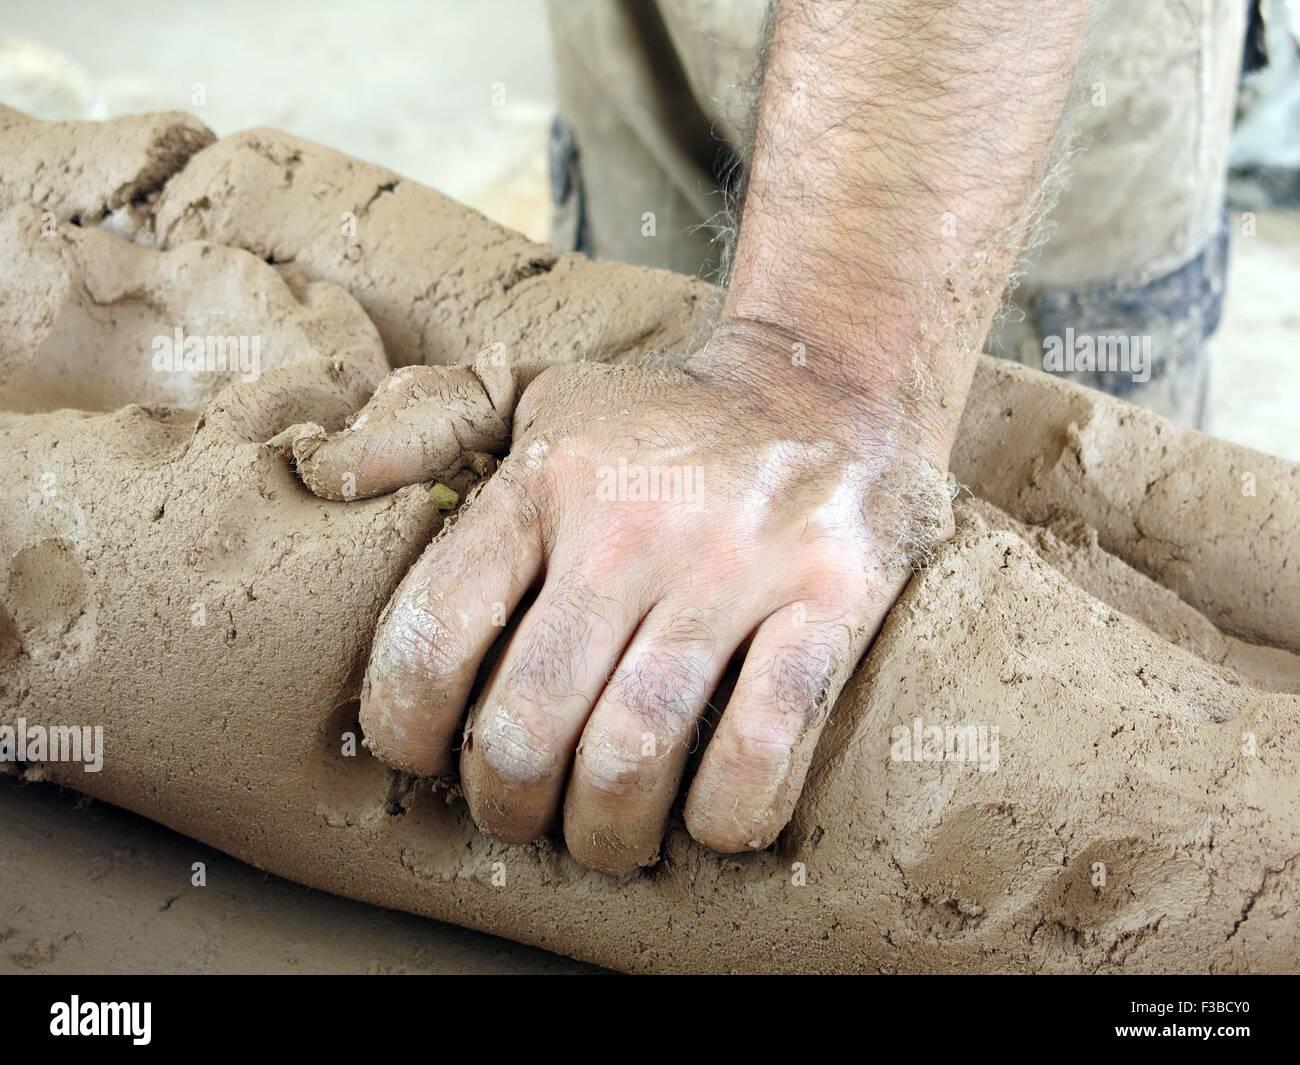 Baghdad in Iraq. 4 Ott 2015. Abu Ibrahim rende vasi in ceramica presso la sua officina in Kadhimiya, Iraq, il 4 Immagini Stock